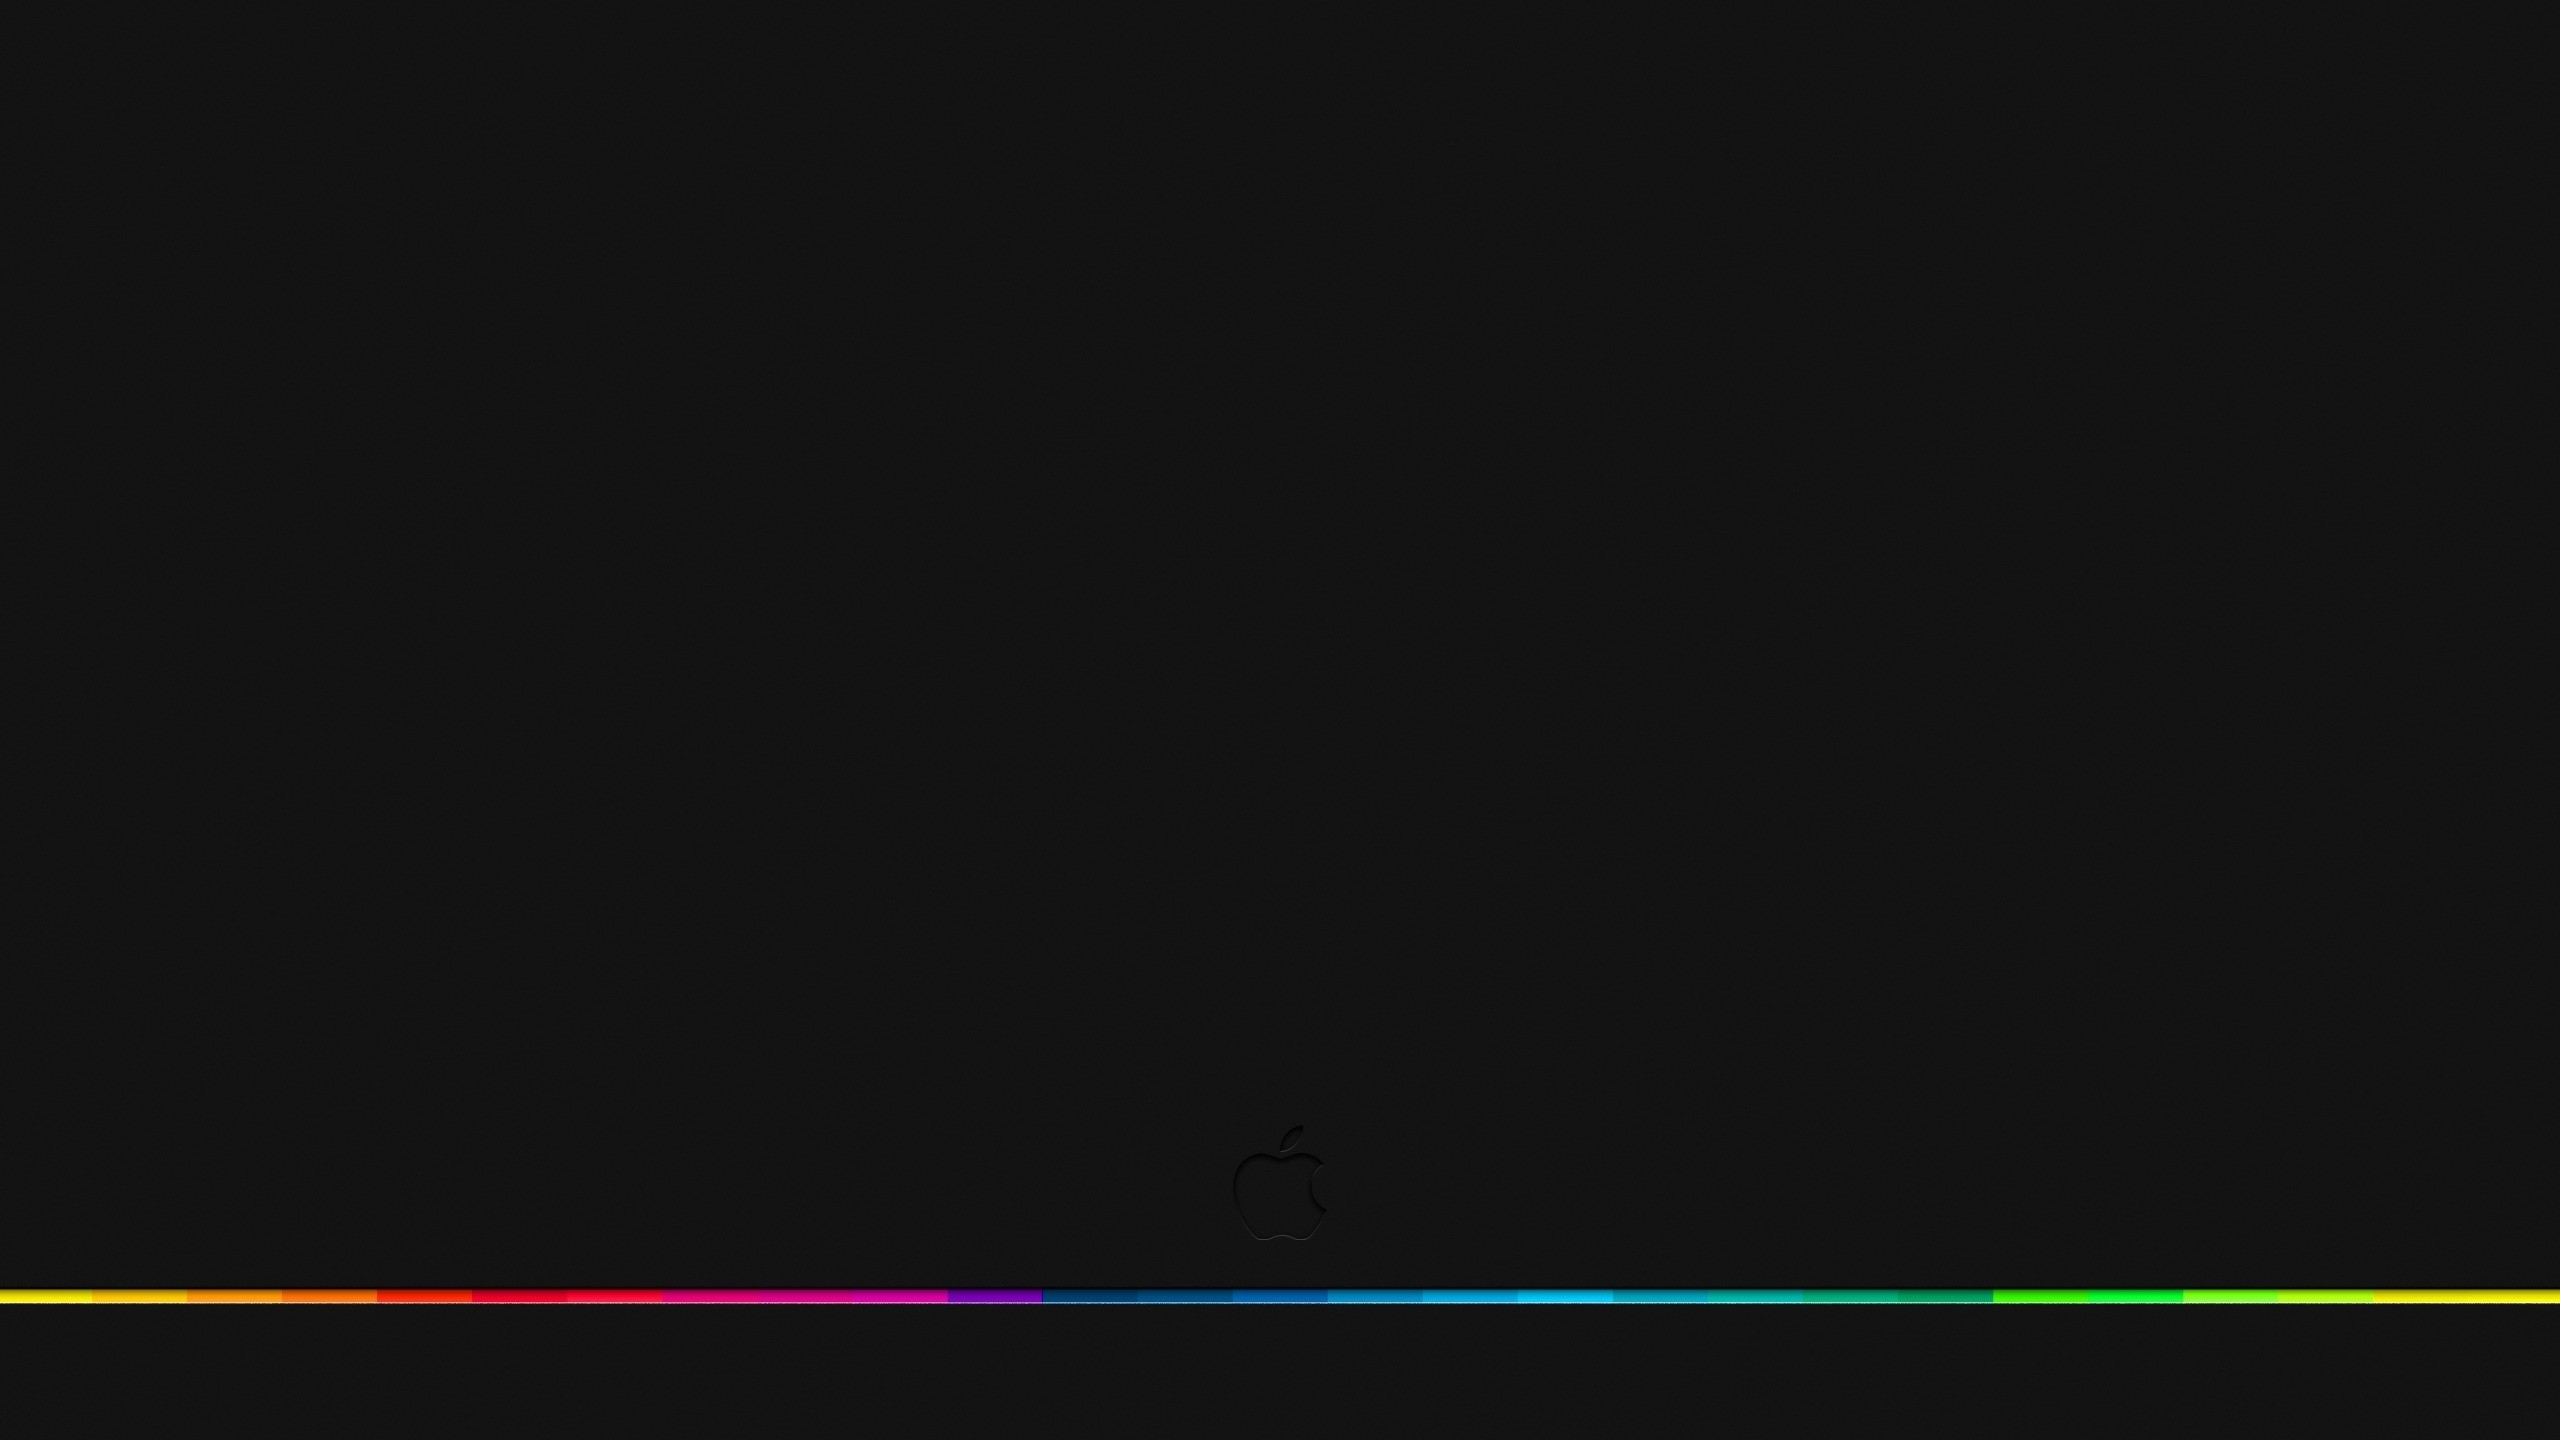 2560x1440 black wallpaper (84+ images)